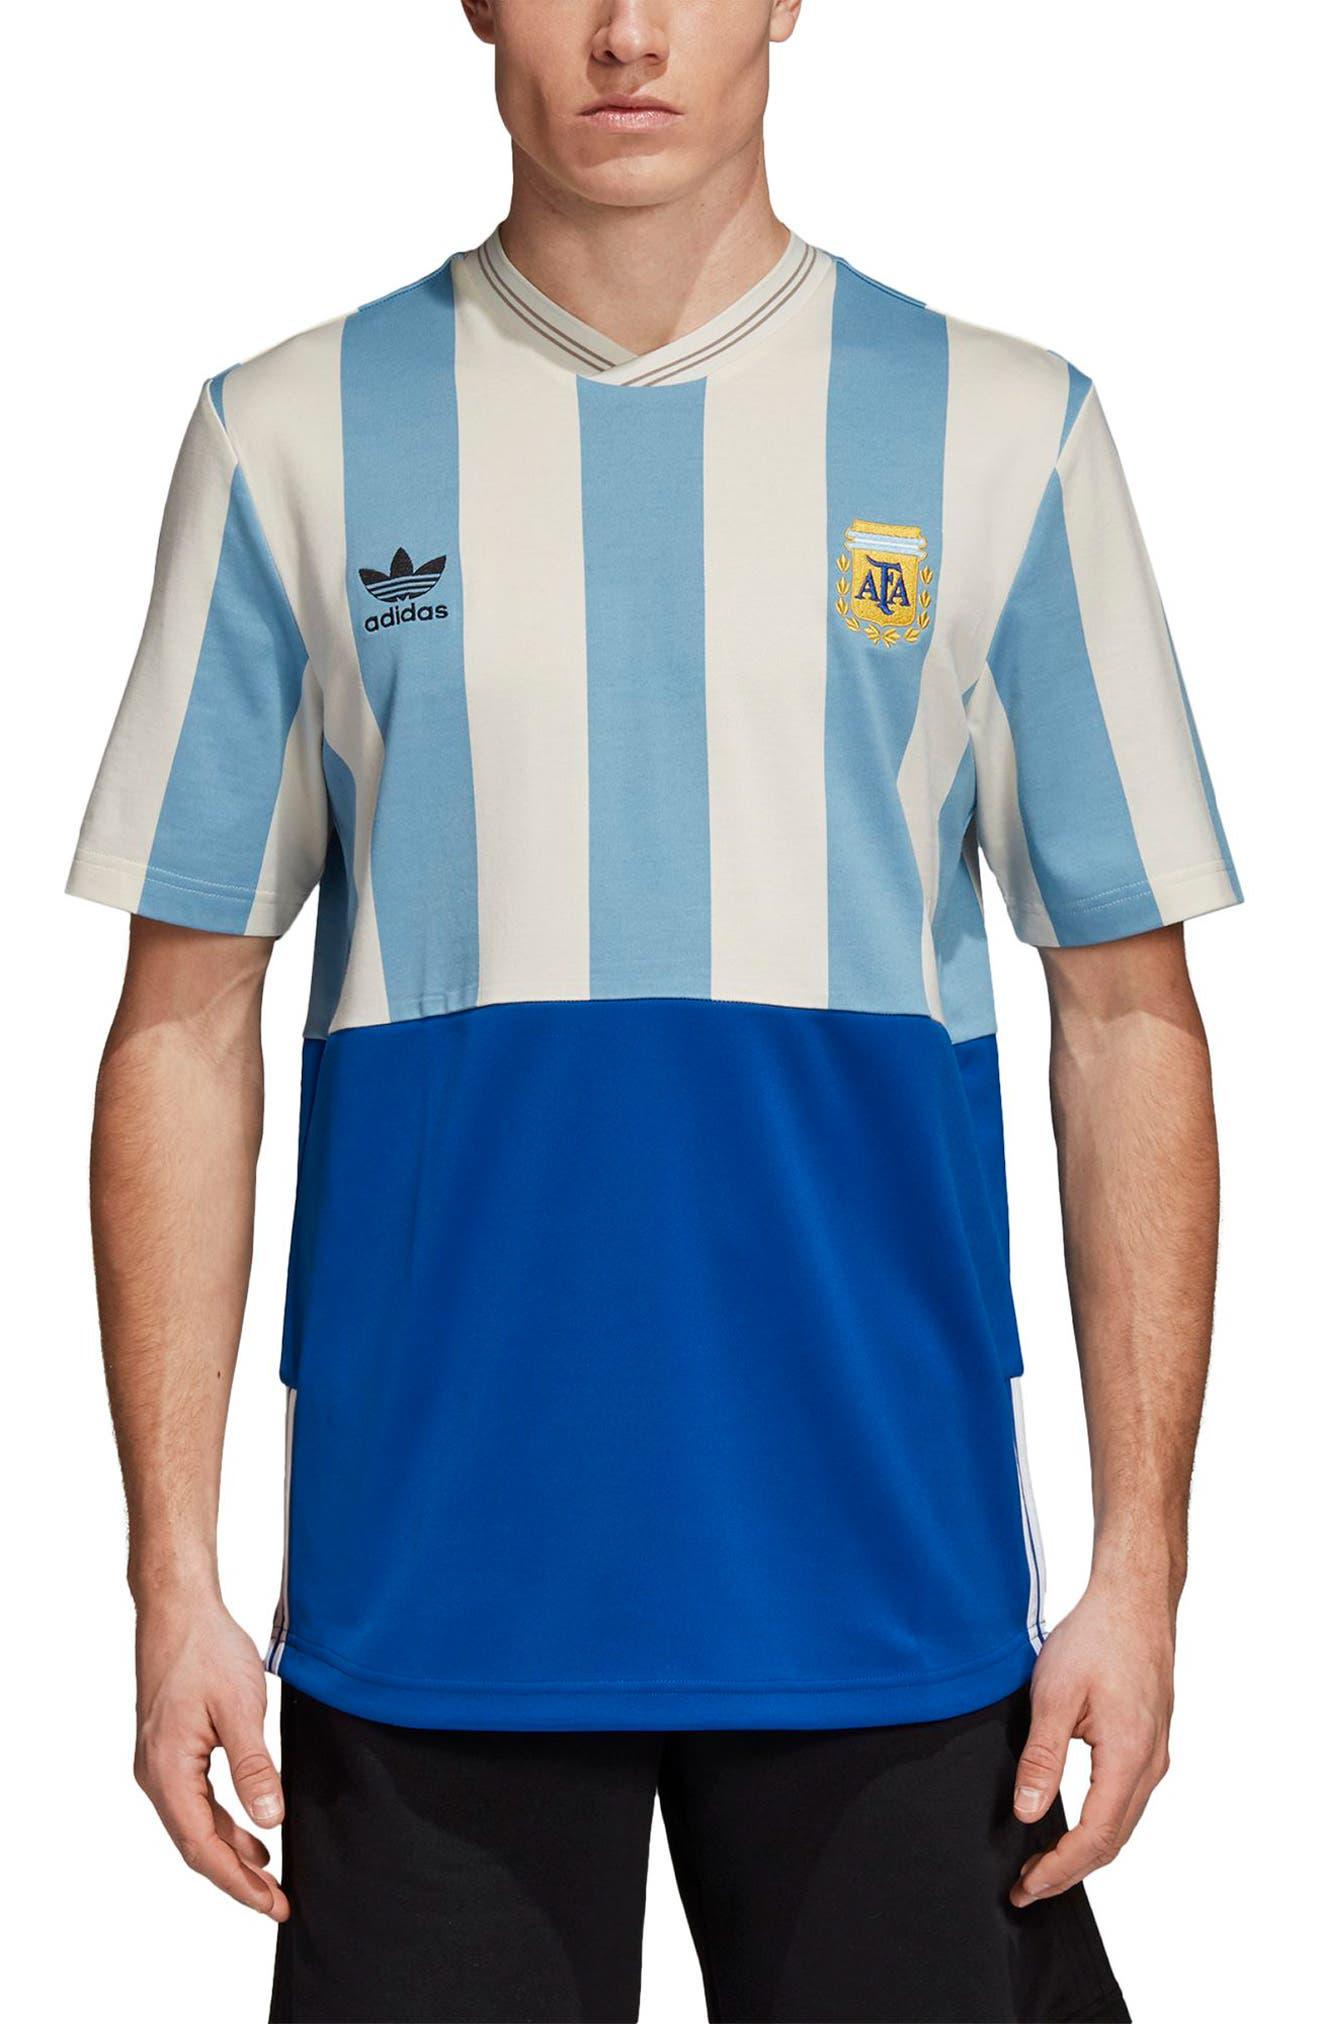 ca3797dd0c9 Adidas Originals Argentina Retro T Shirt - BCD Tofu House